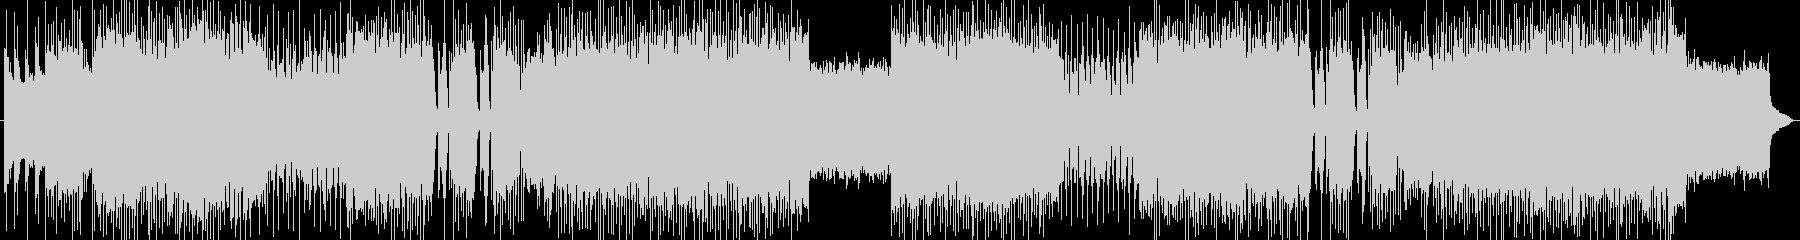 「HR/HM」「DARK」BGM236の未再生の波形